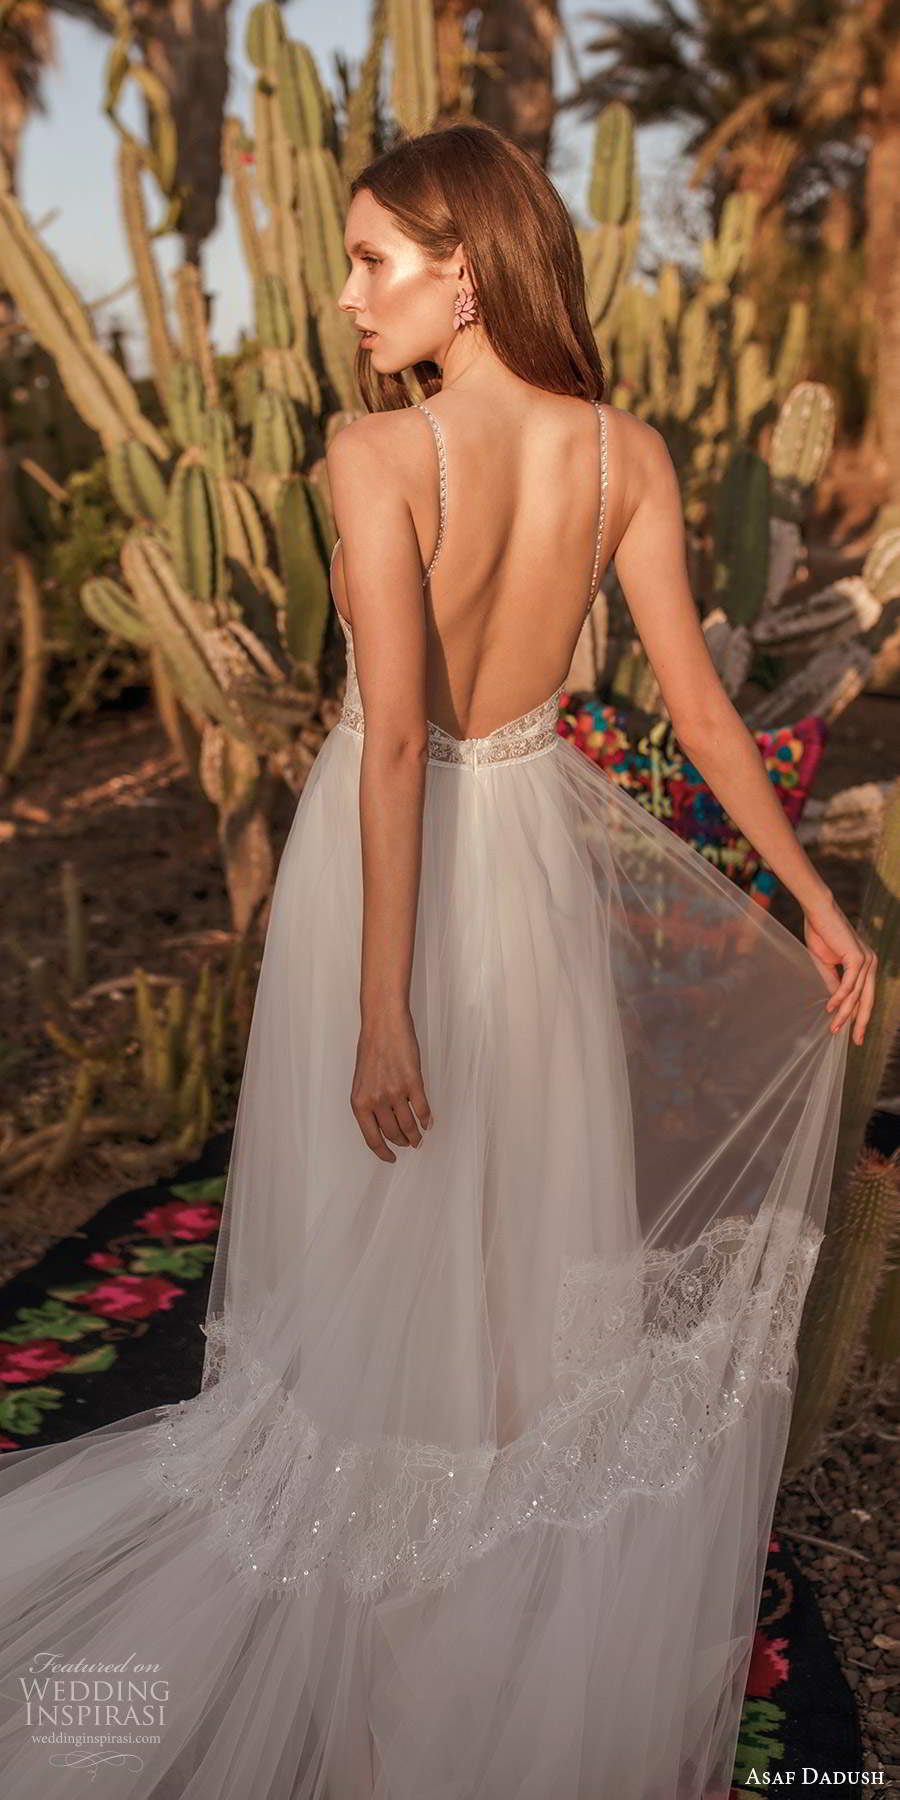 asaf dadush 2020 bridal sleeveless thin beaded straps v neckline embellished bodice a line ball gown wedding dress open back (11) bv